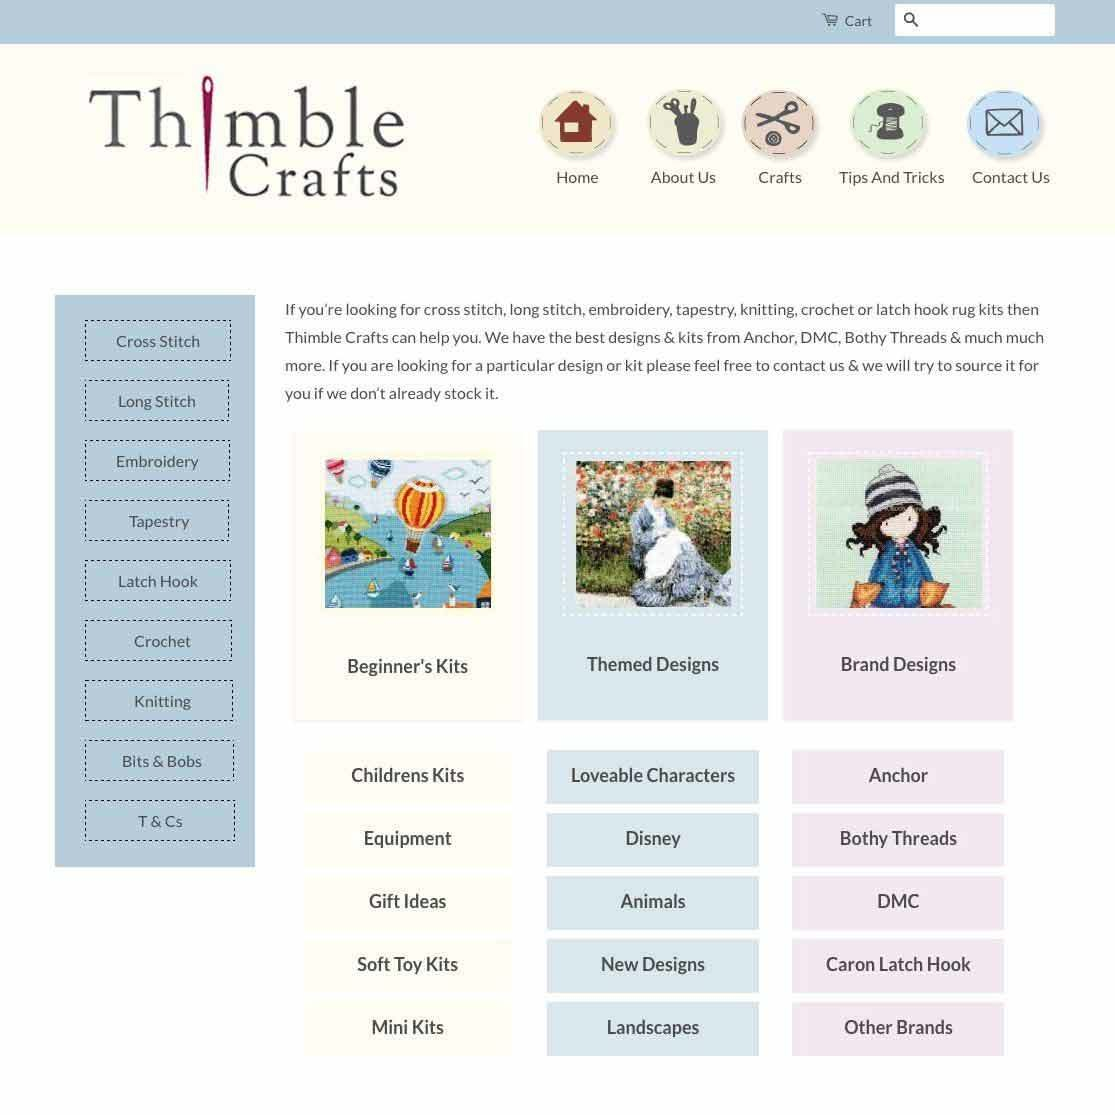 Thimble Crafts website design